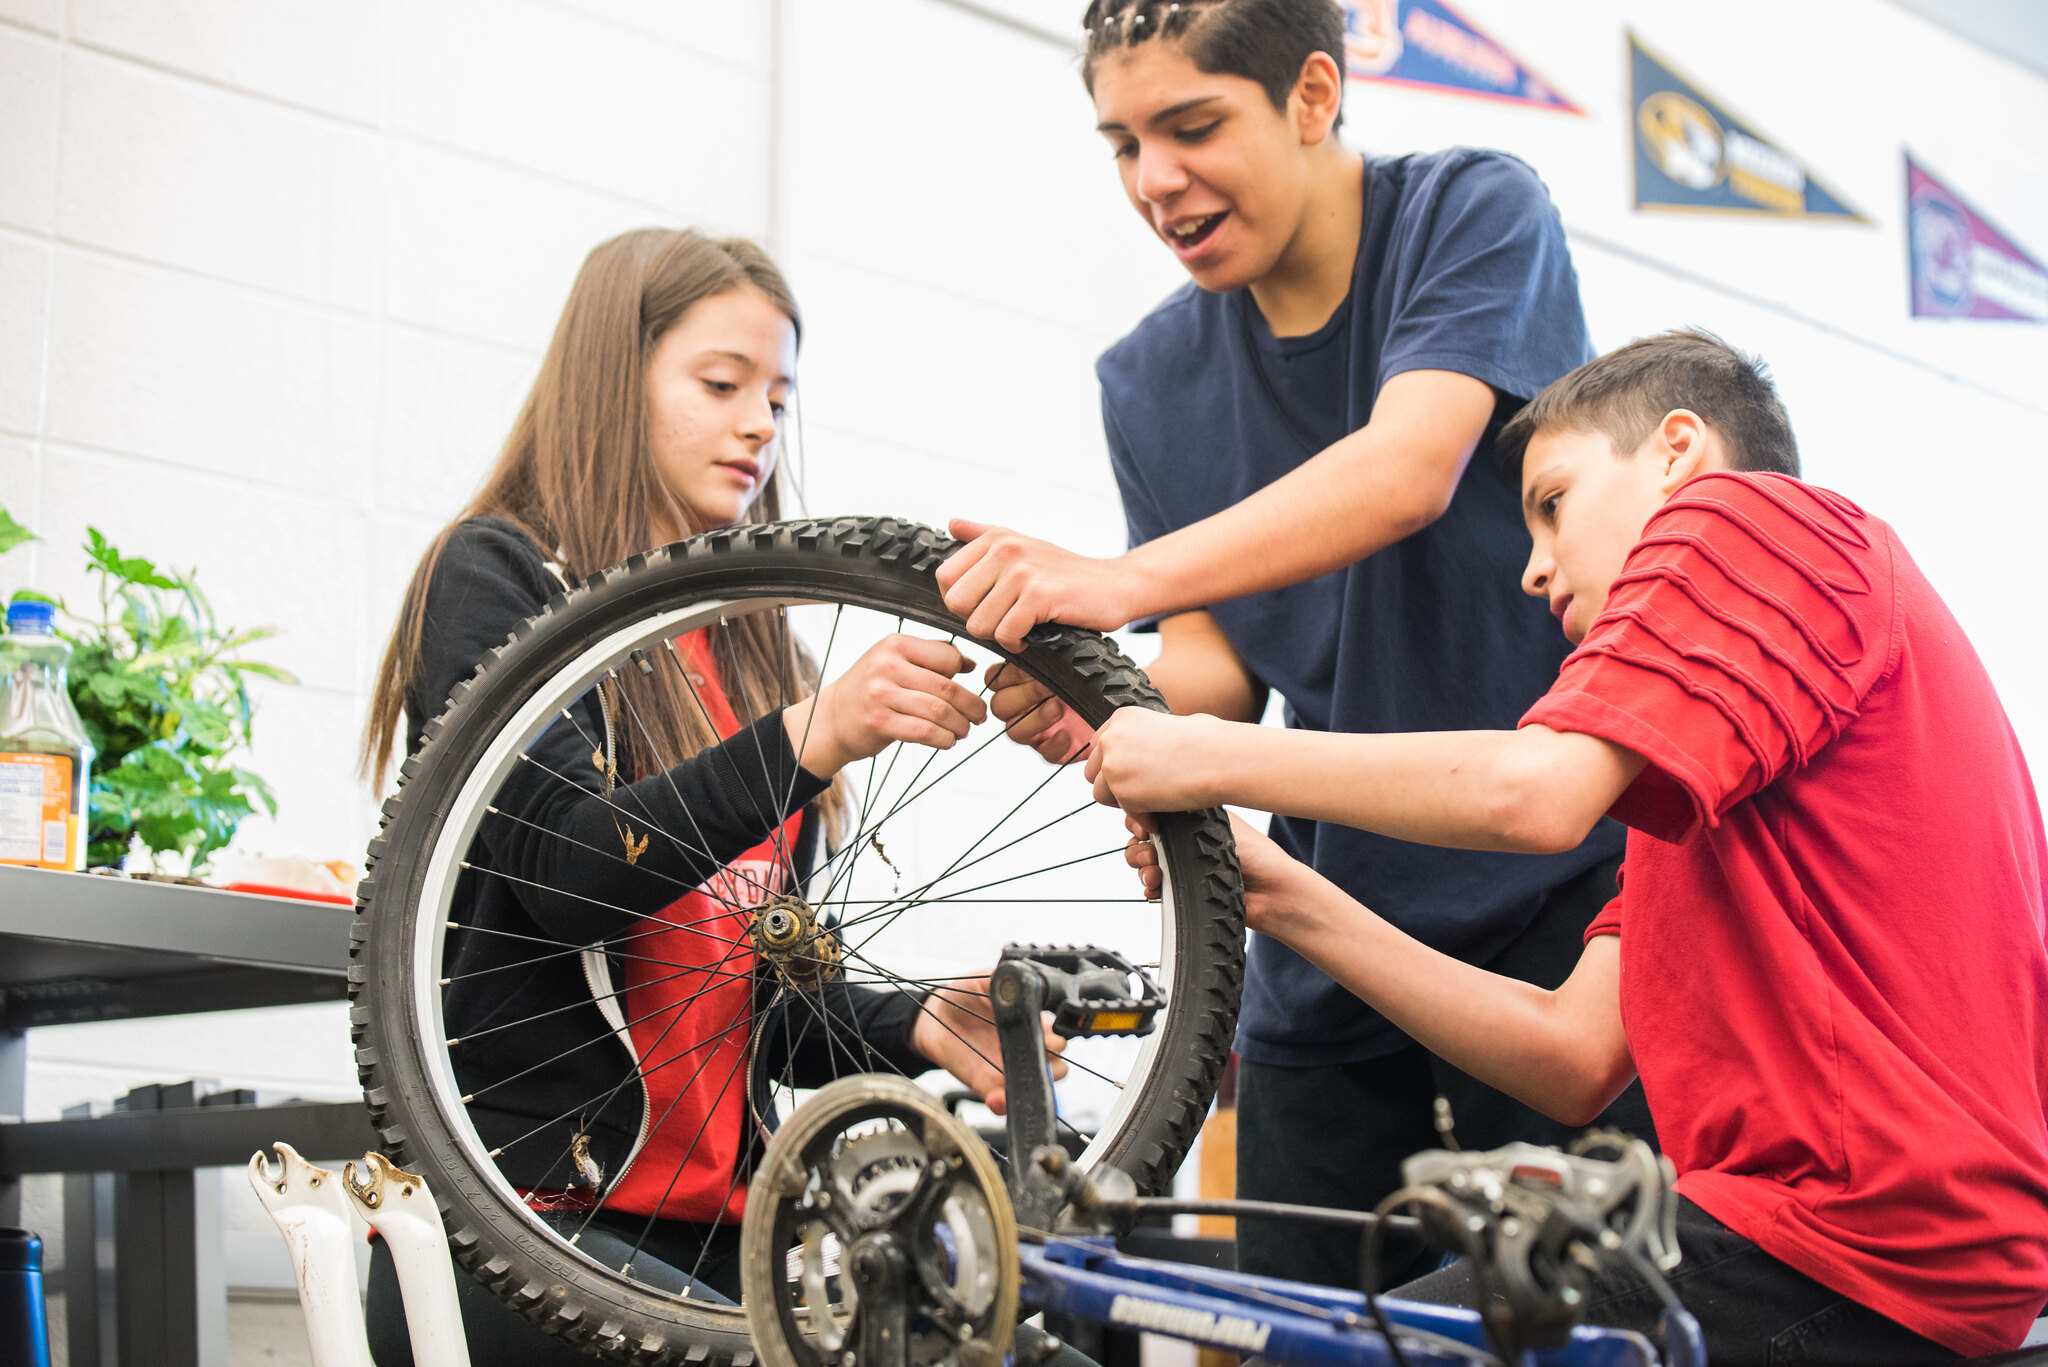 students working on a bike